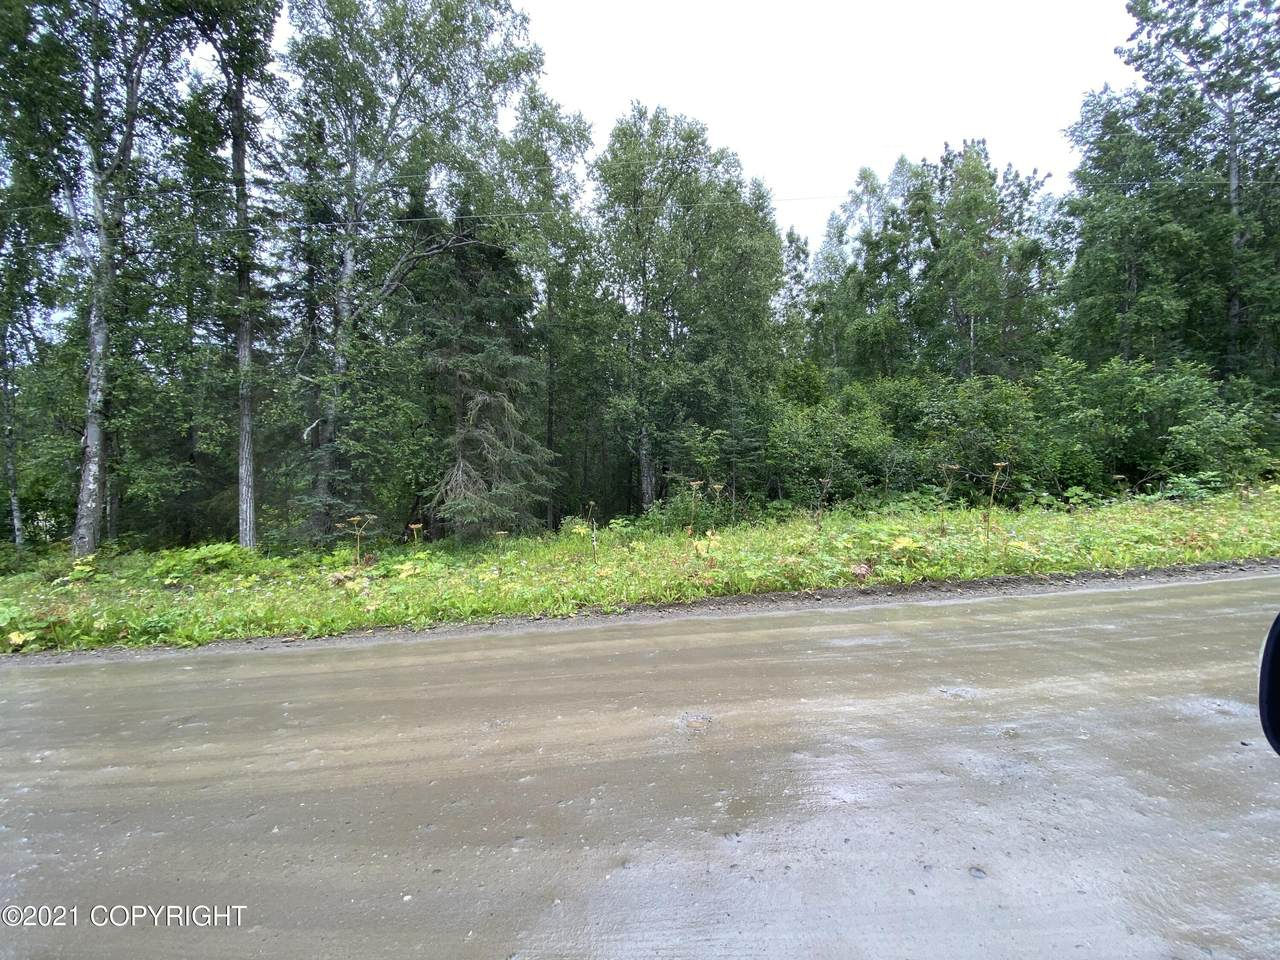 https://bt-photos.global.ssl.fastly.net/alaska/1280_boomver_1_21-13663-2.jpg